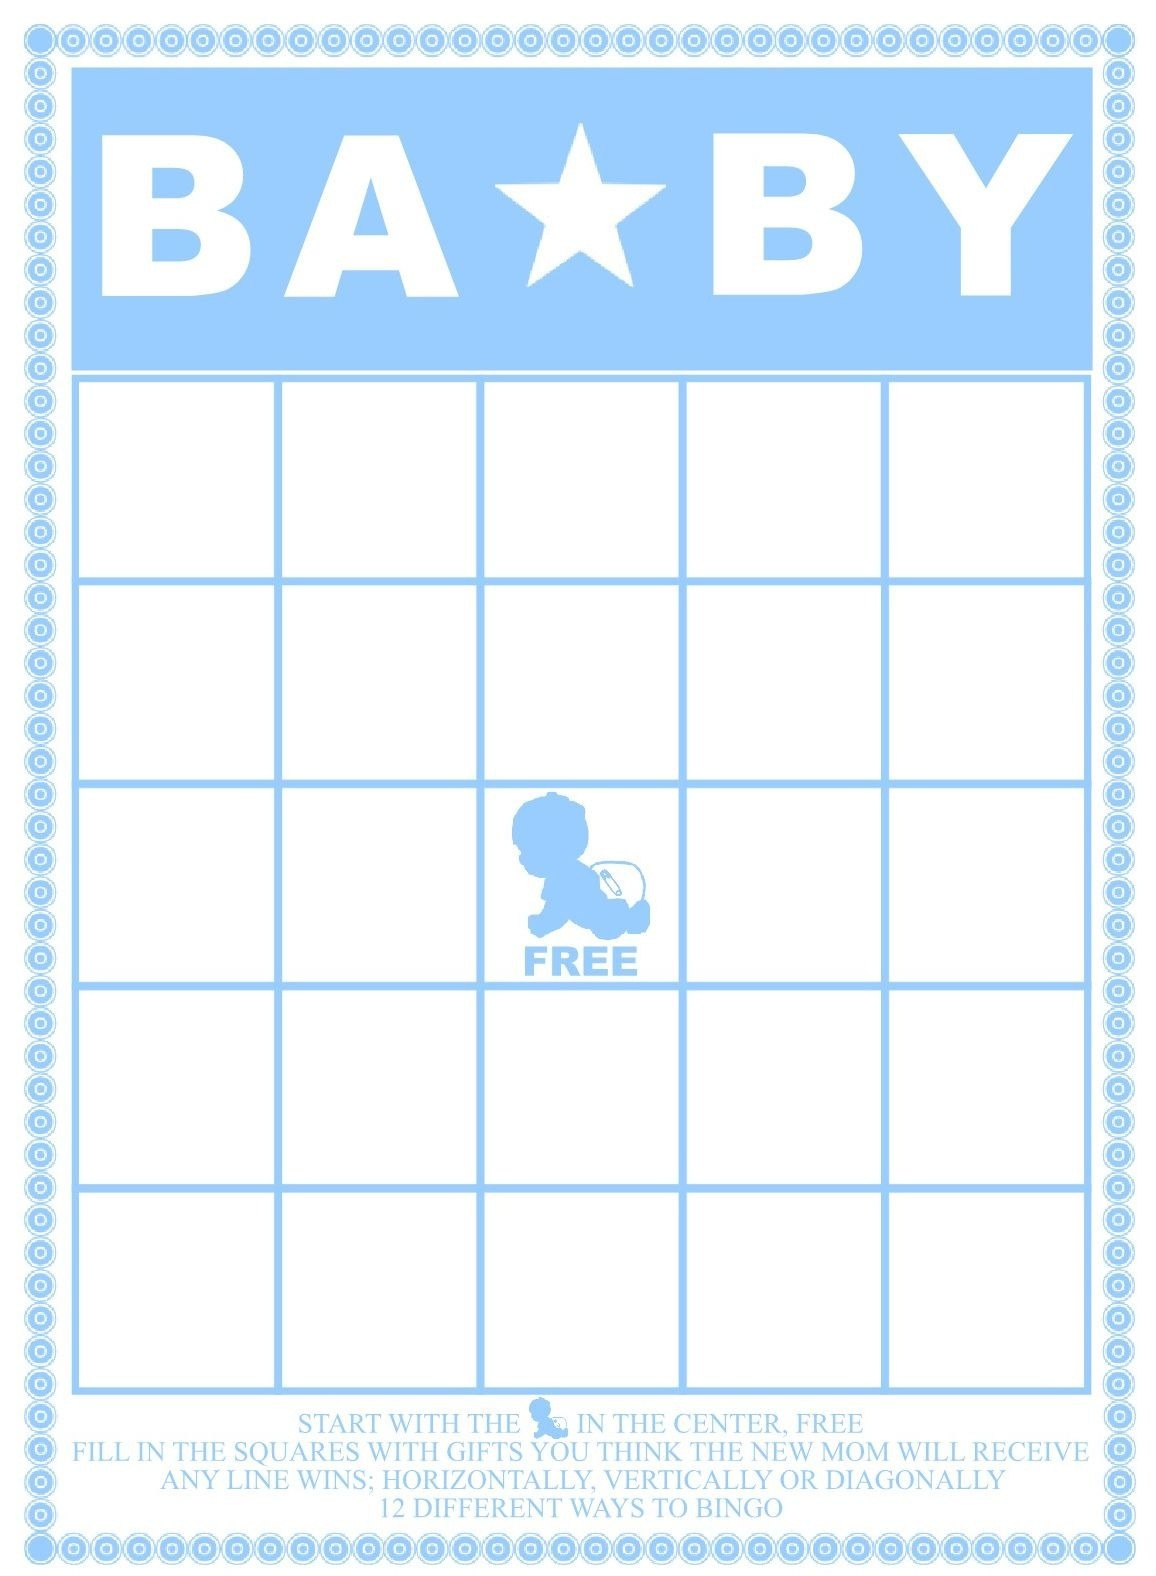 Baby Bingo Template - Kaza.psstech.co - Baby Bingo Free Printable Template